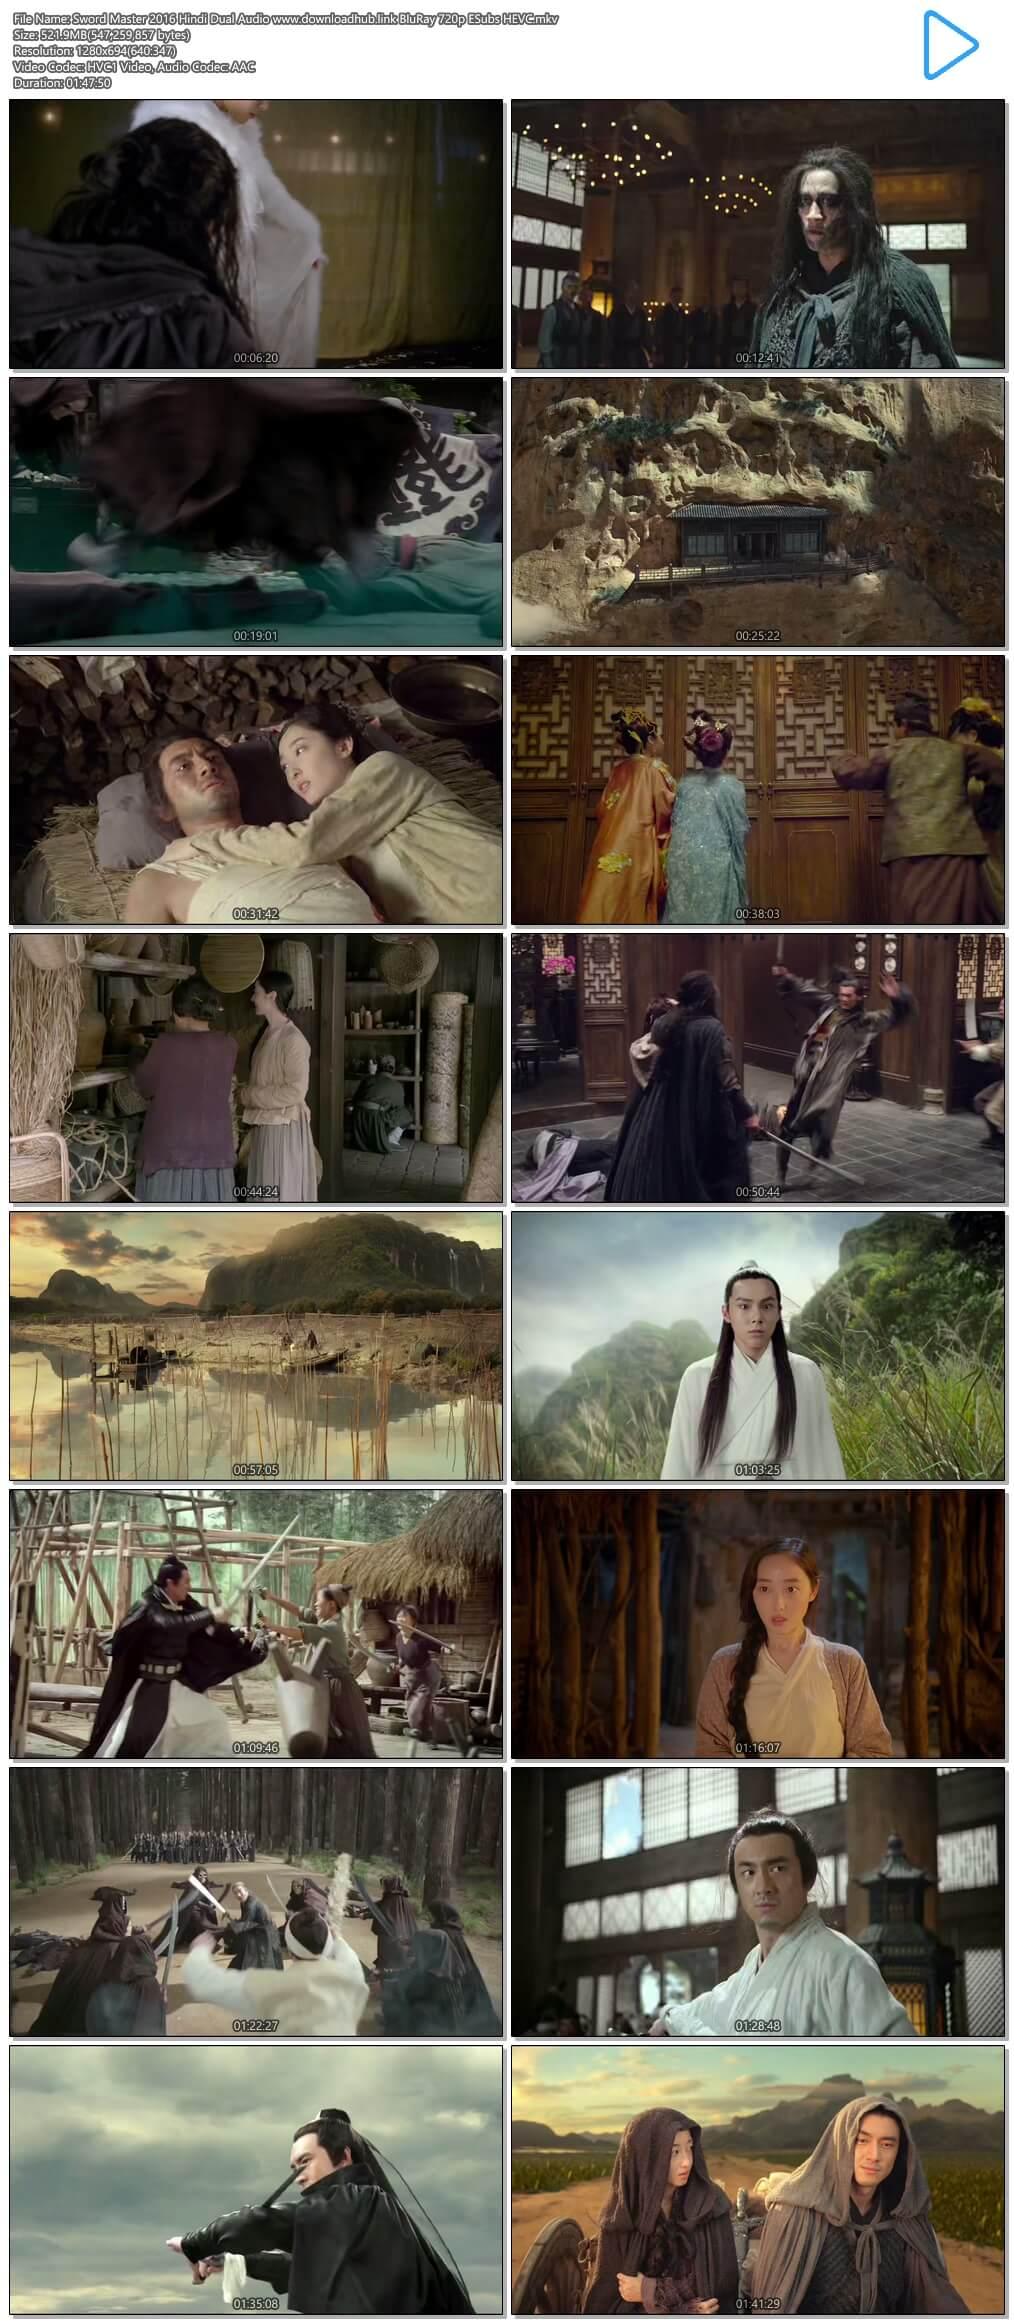 Sword Master 2016 Hindi Dual Audio 500MB BluRay 720p ESubs HEVC